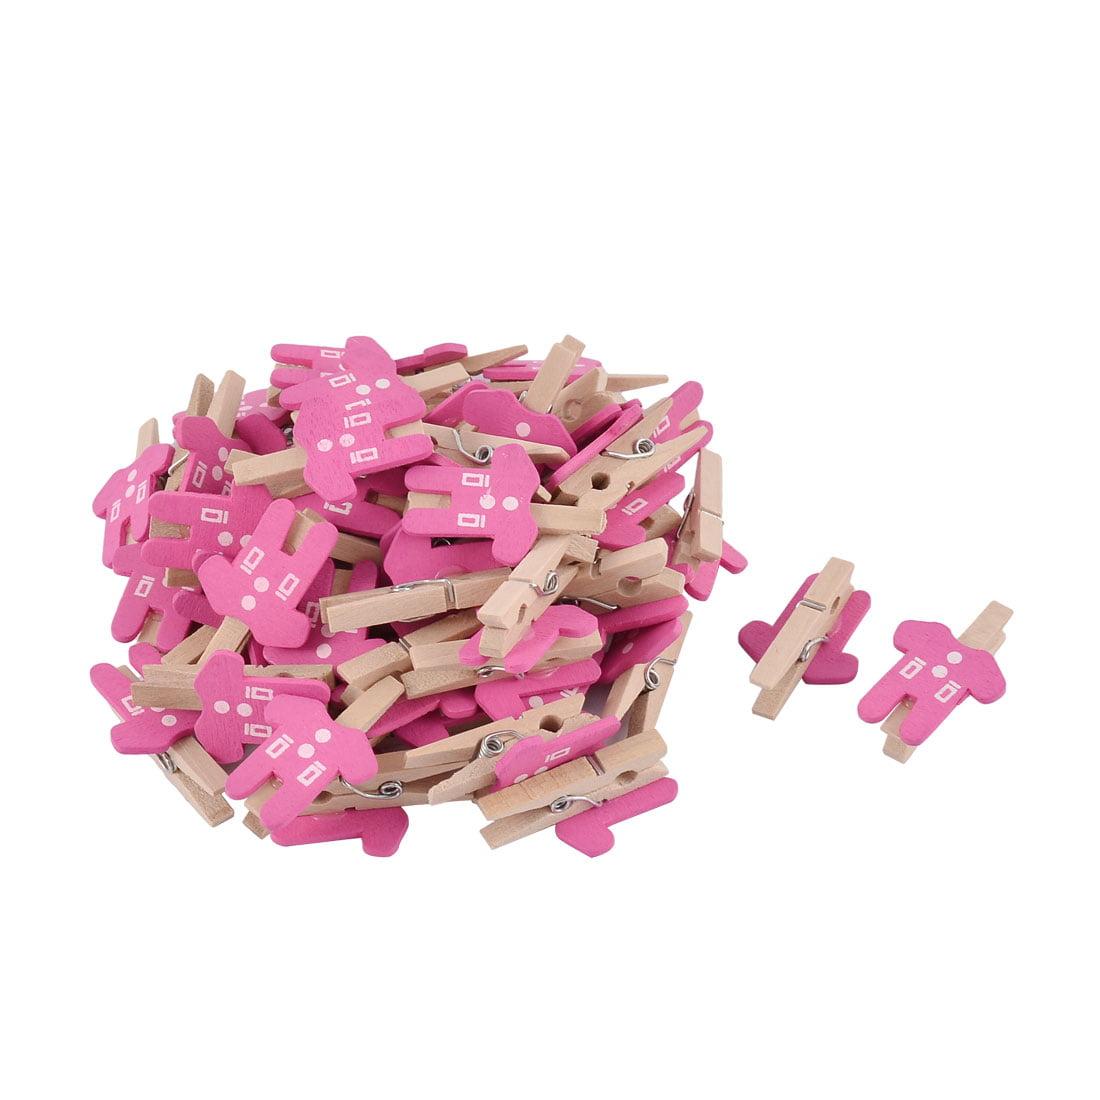 Card Photo Paper Clothes Shape Crafts  Wooden Clip Peg Fuchsia 50pcs